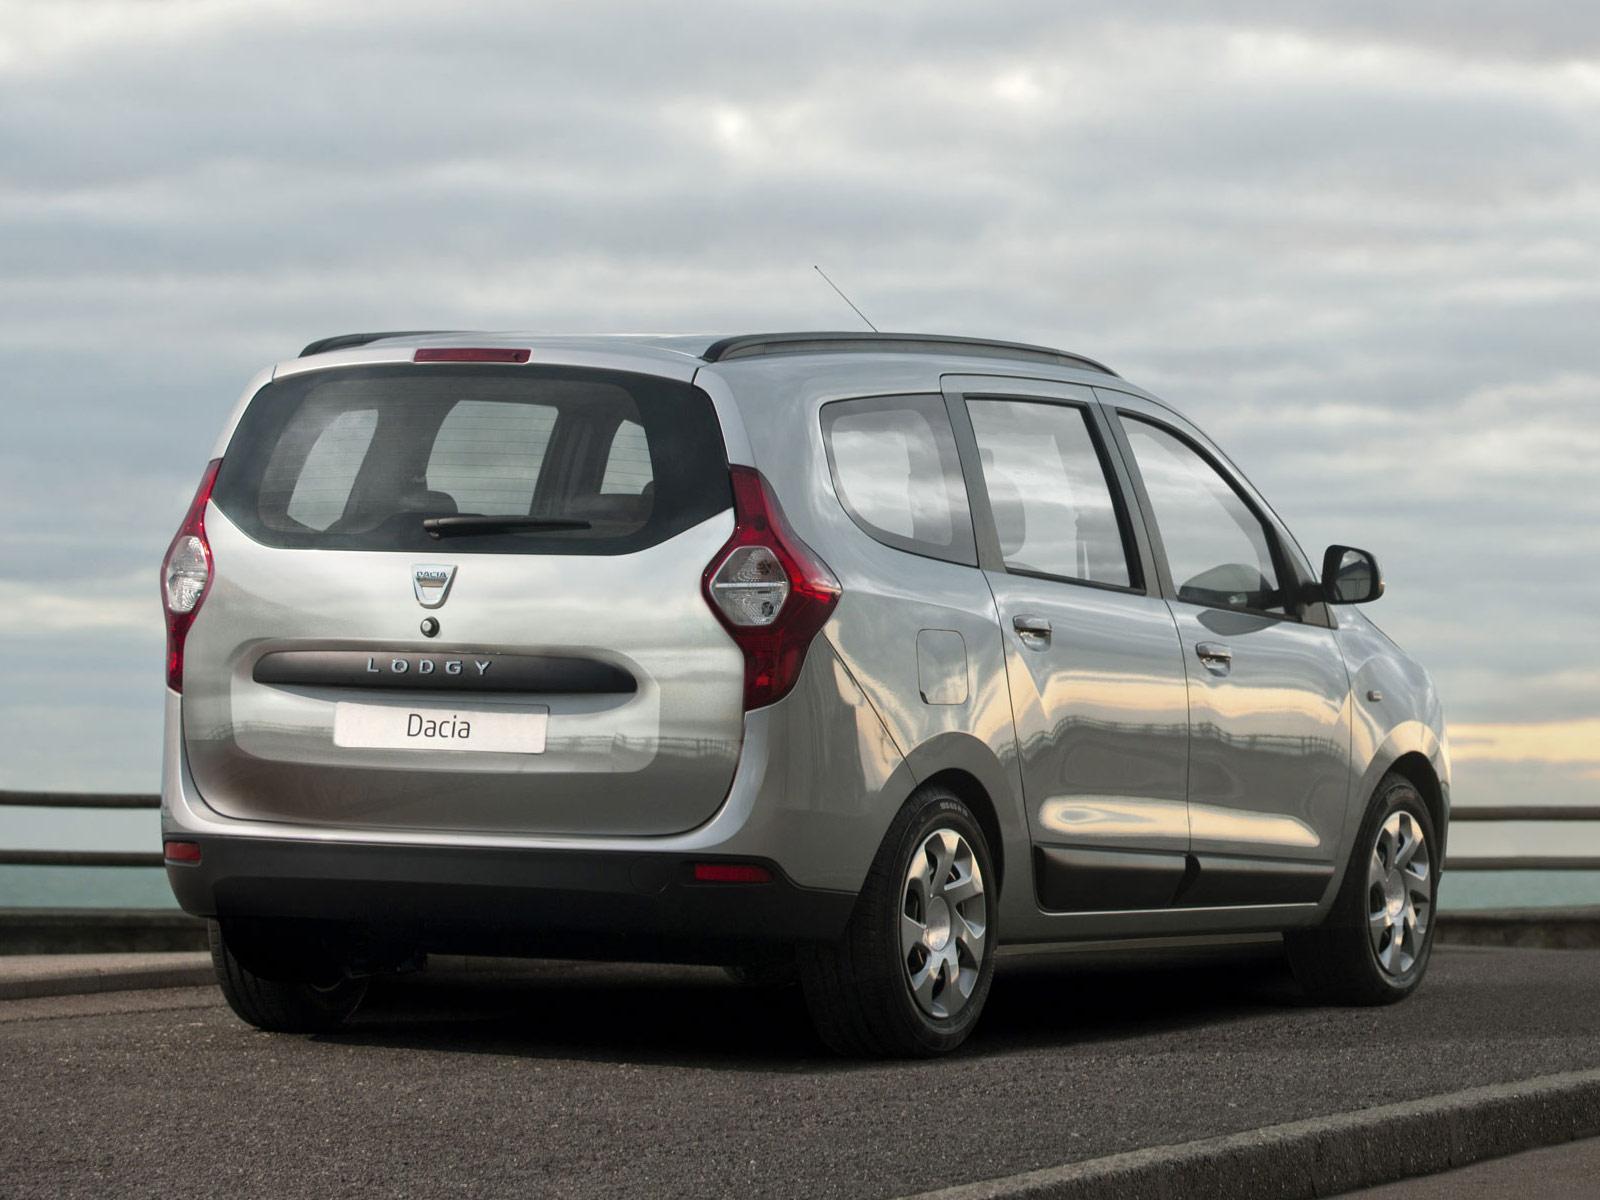 Trying The Cheapest Car In Europe: The Dacia Sandero - Fifth Gear - YouTube  |Dacia